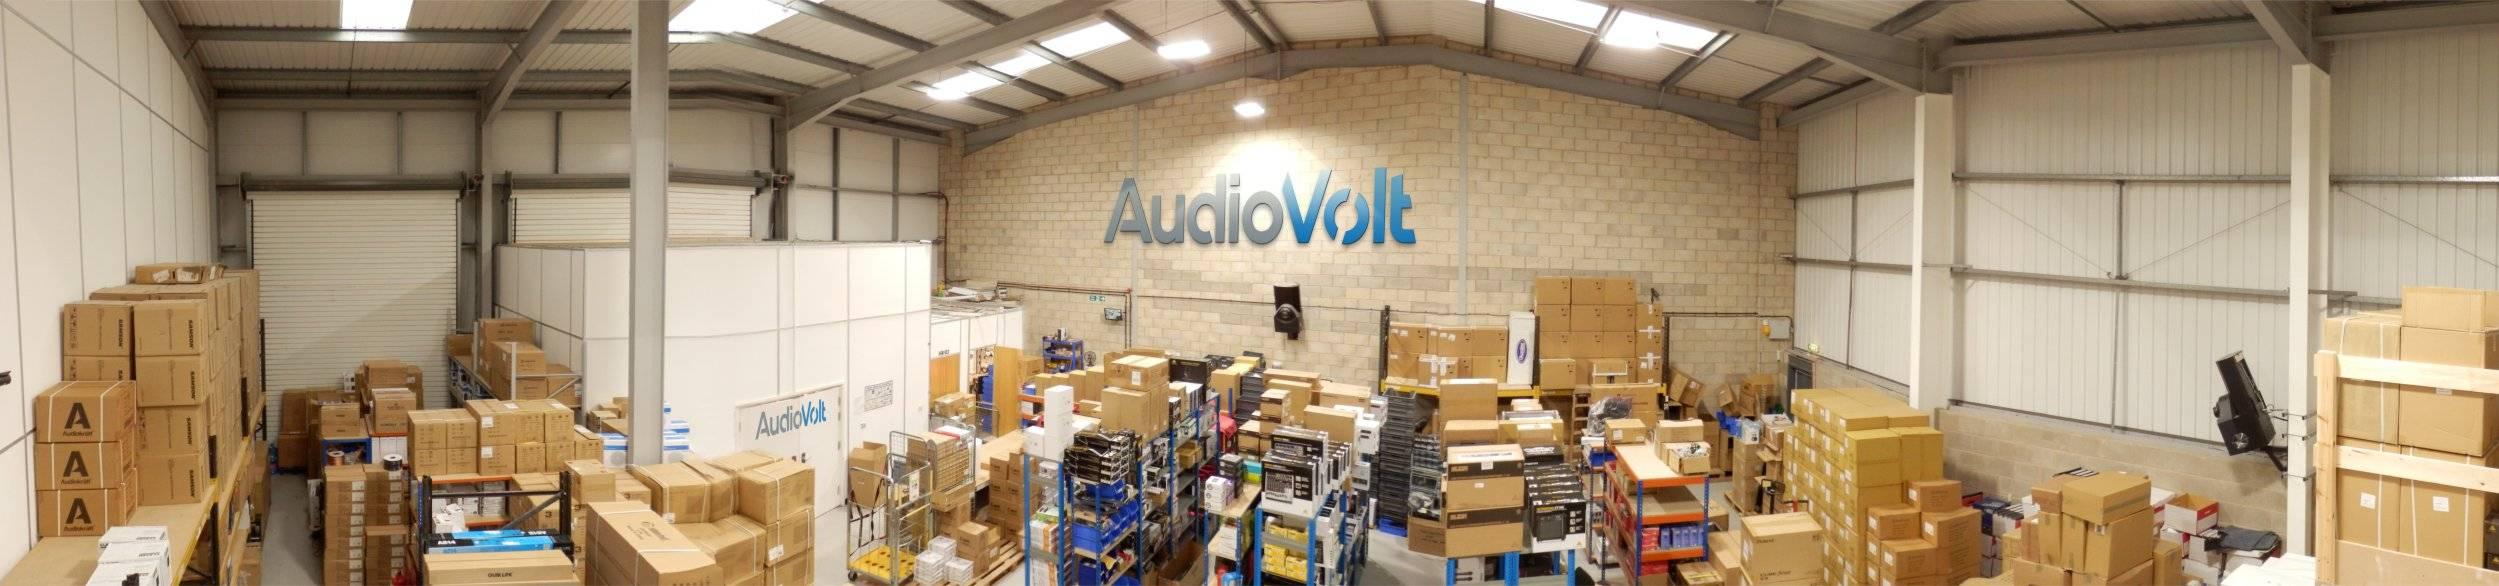 Audio Volt  purpose built 5,700 sq ft warehouse